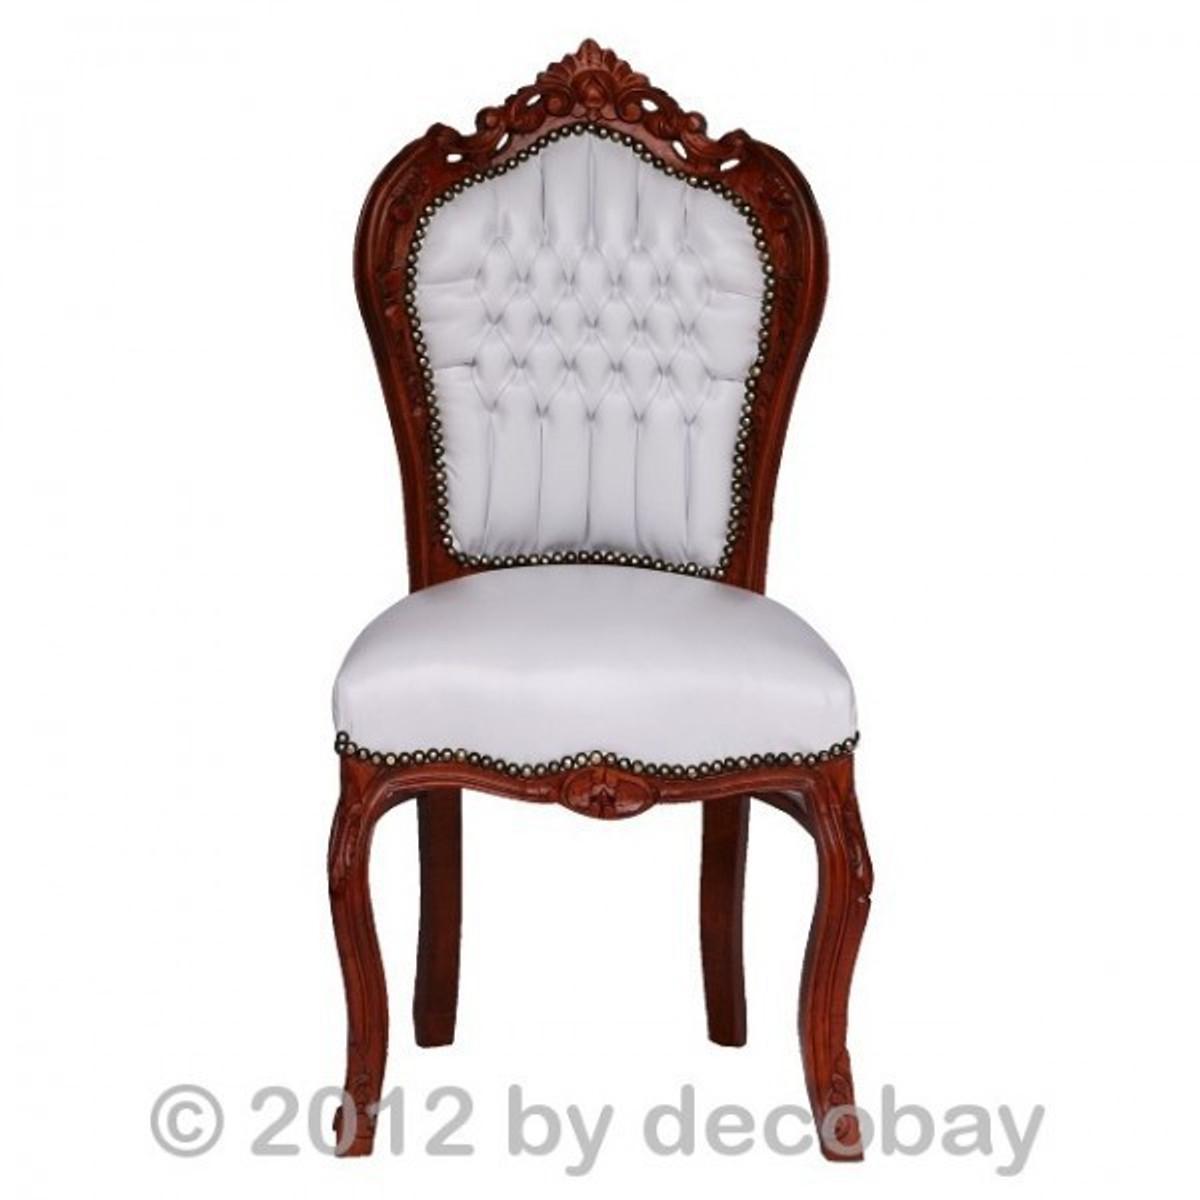 Weiß Braune Kunstleder Stühle Möbel Einrichtung Stuhl Massiv Holz